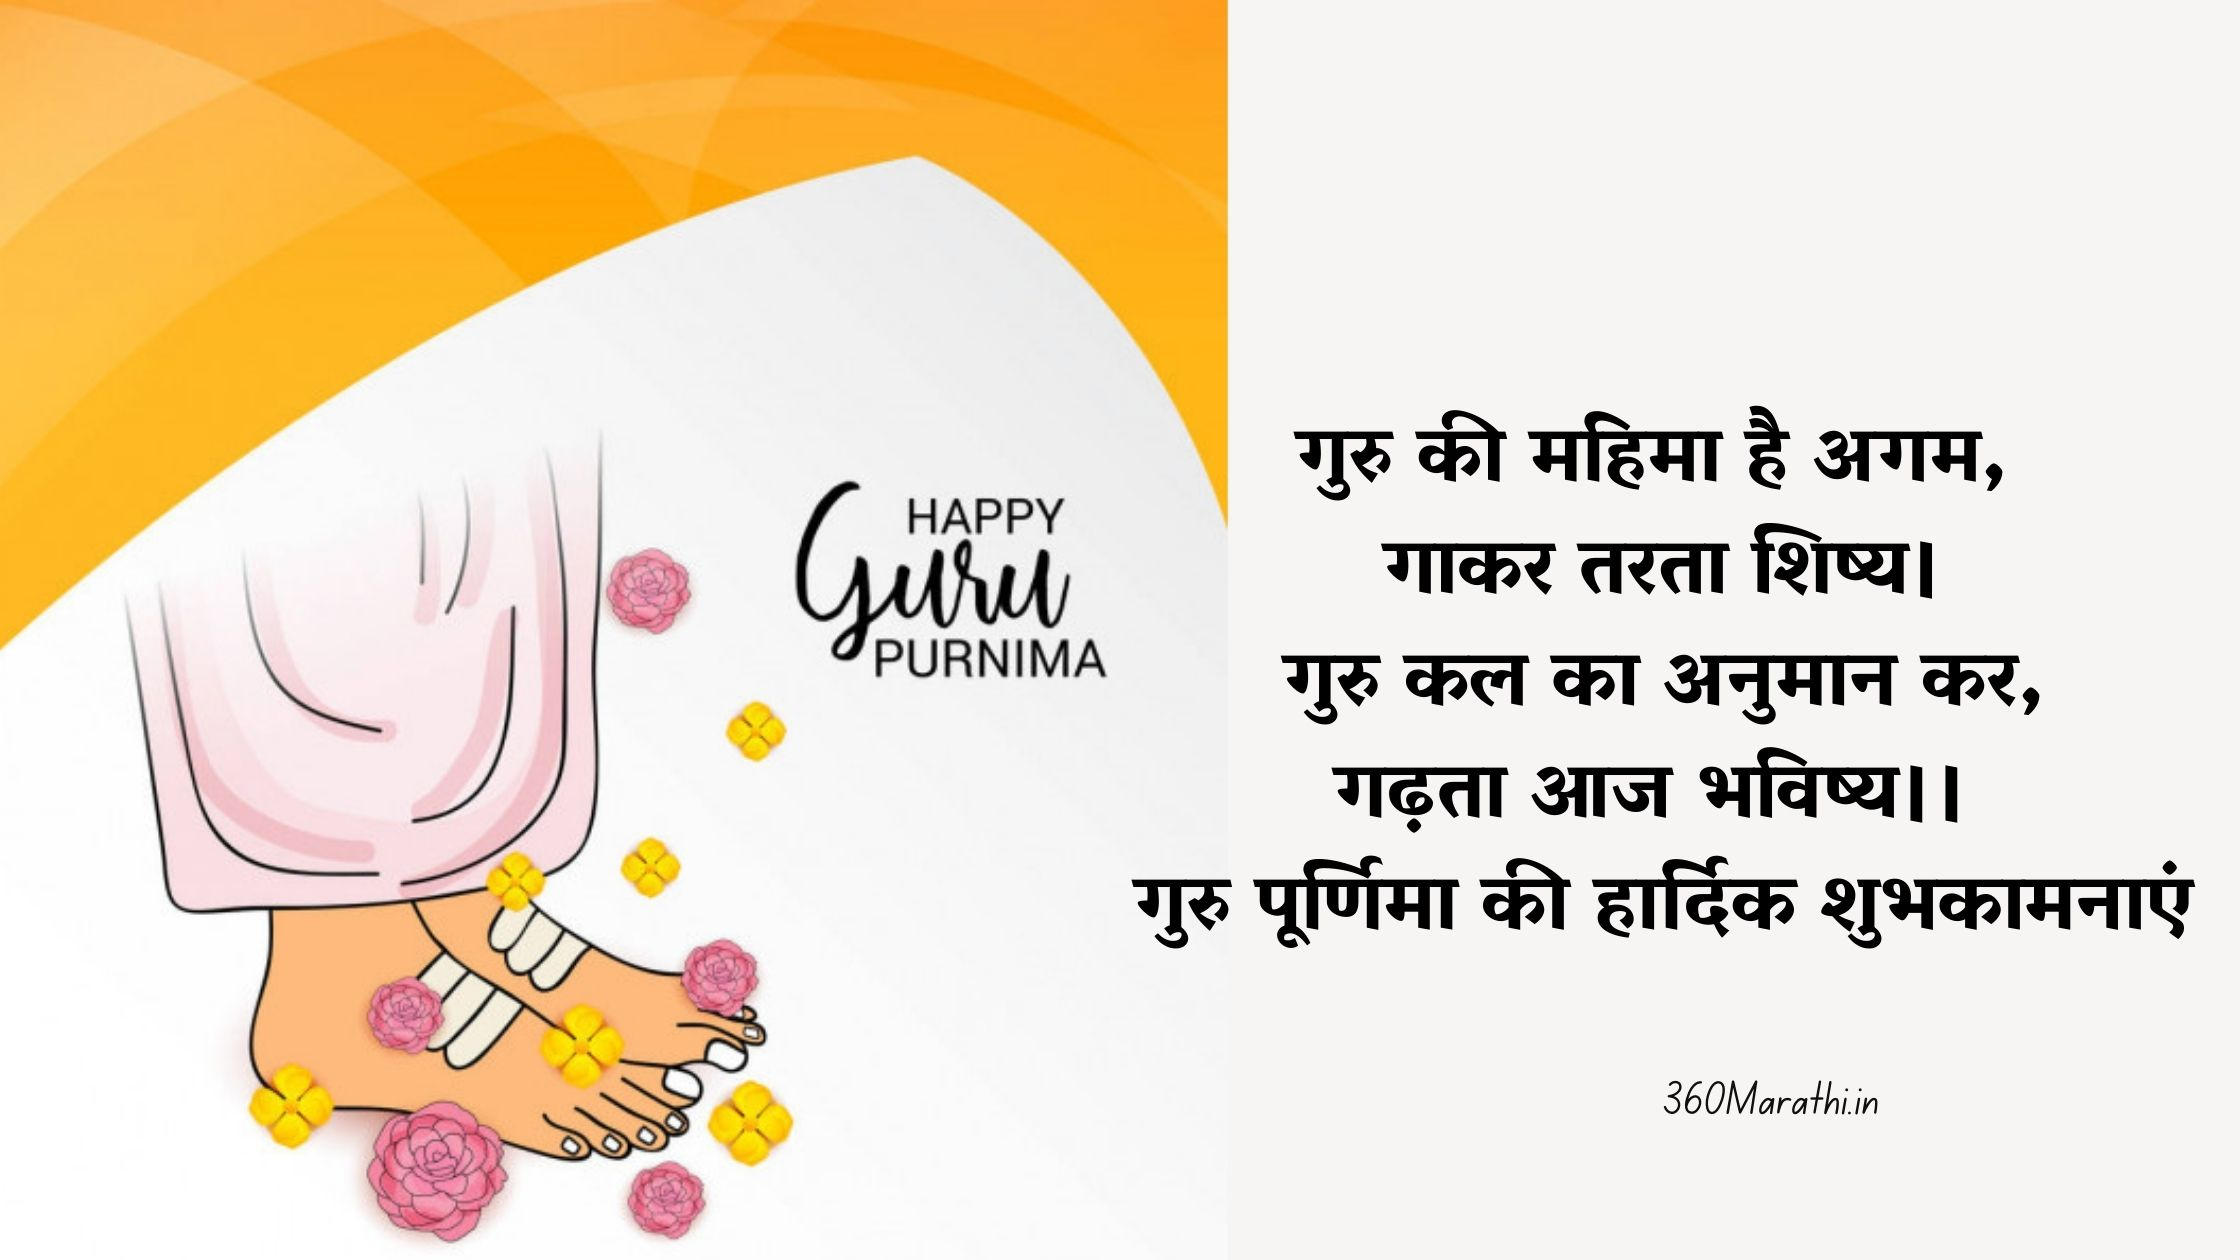 Guru Purnima Quotes in Hindi | गुरु पूर्णिमा संदेश | Guru Purnima Hindi Wishes